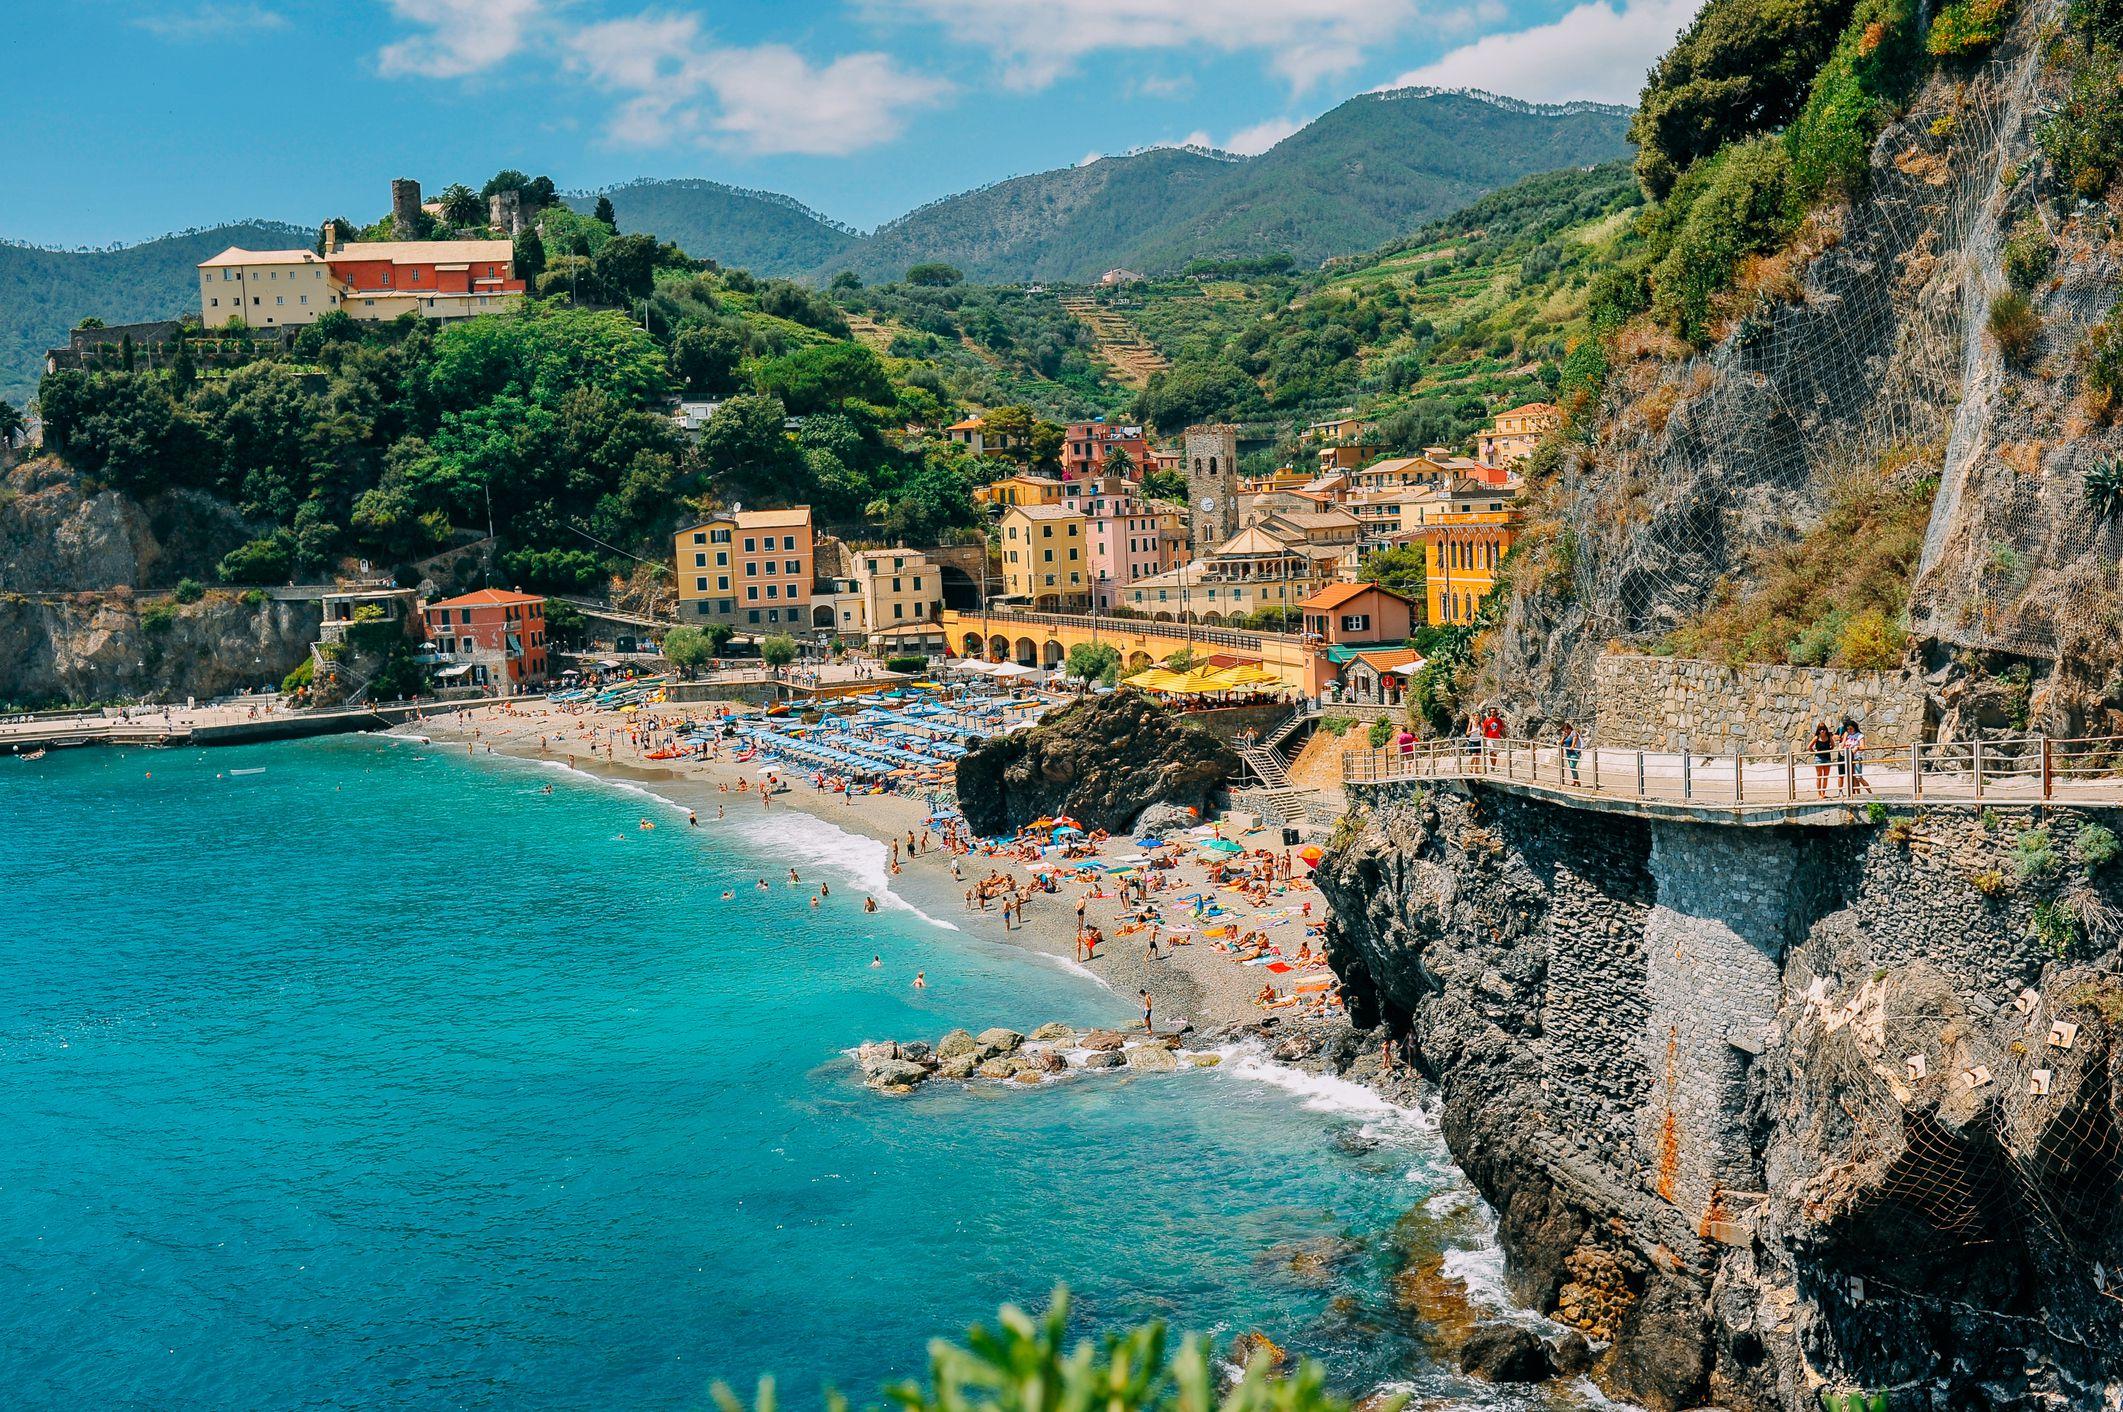 Boat Tour of the Cinque Terre